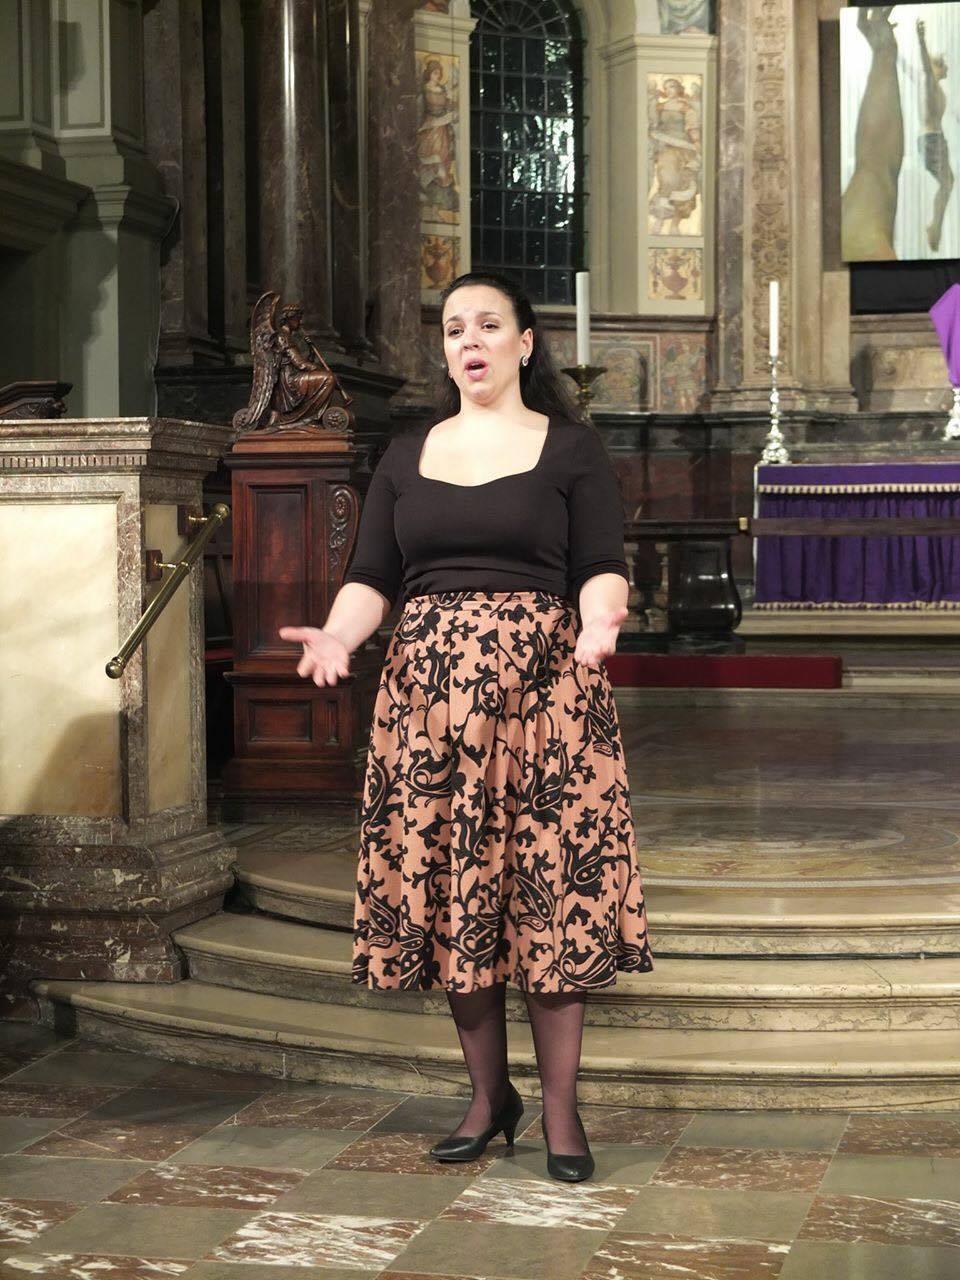 Songs in the city - Canções brasileiras e portuguesas, St. marylebone parish church, londres, 2016